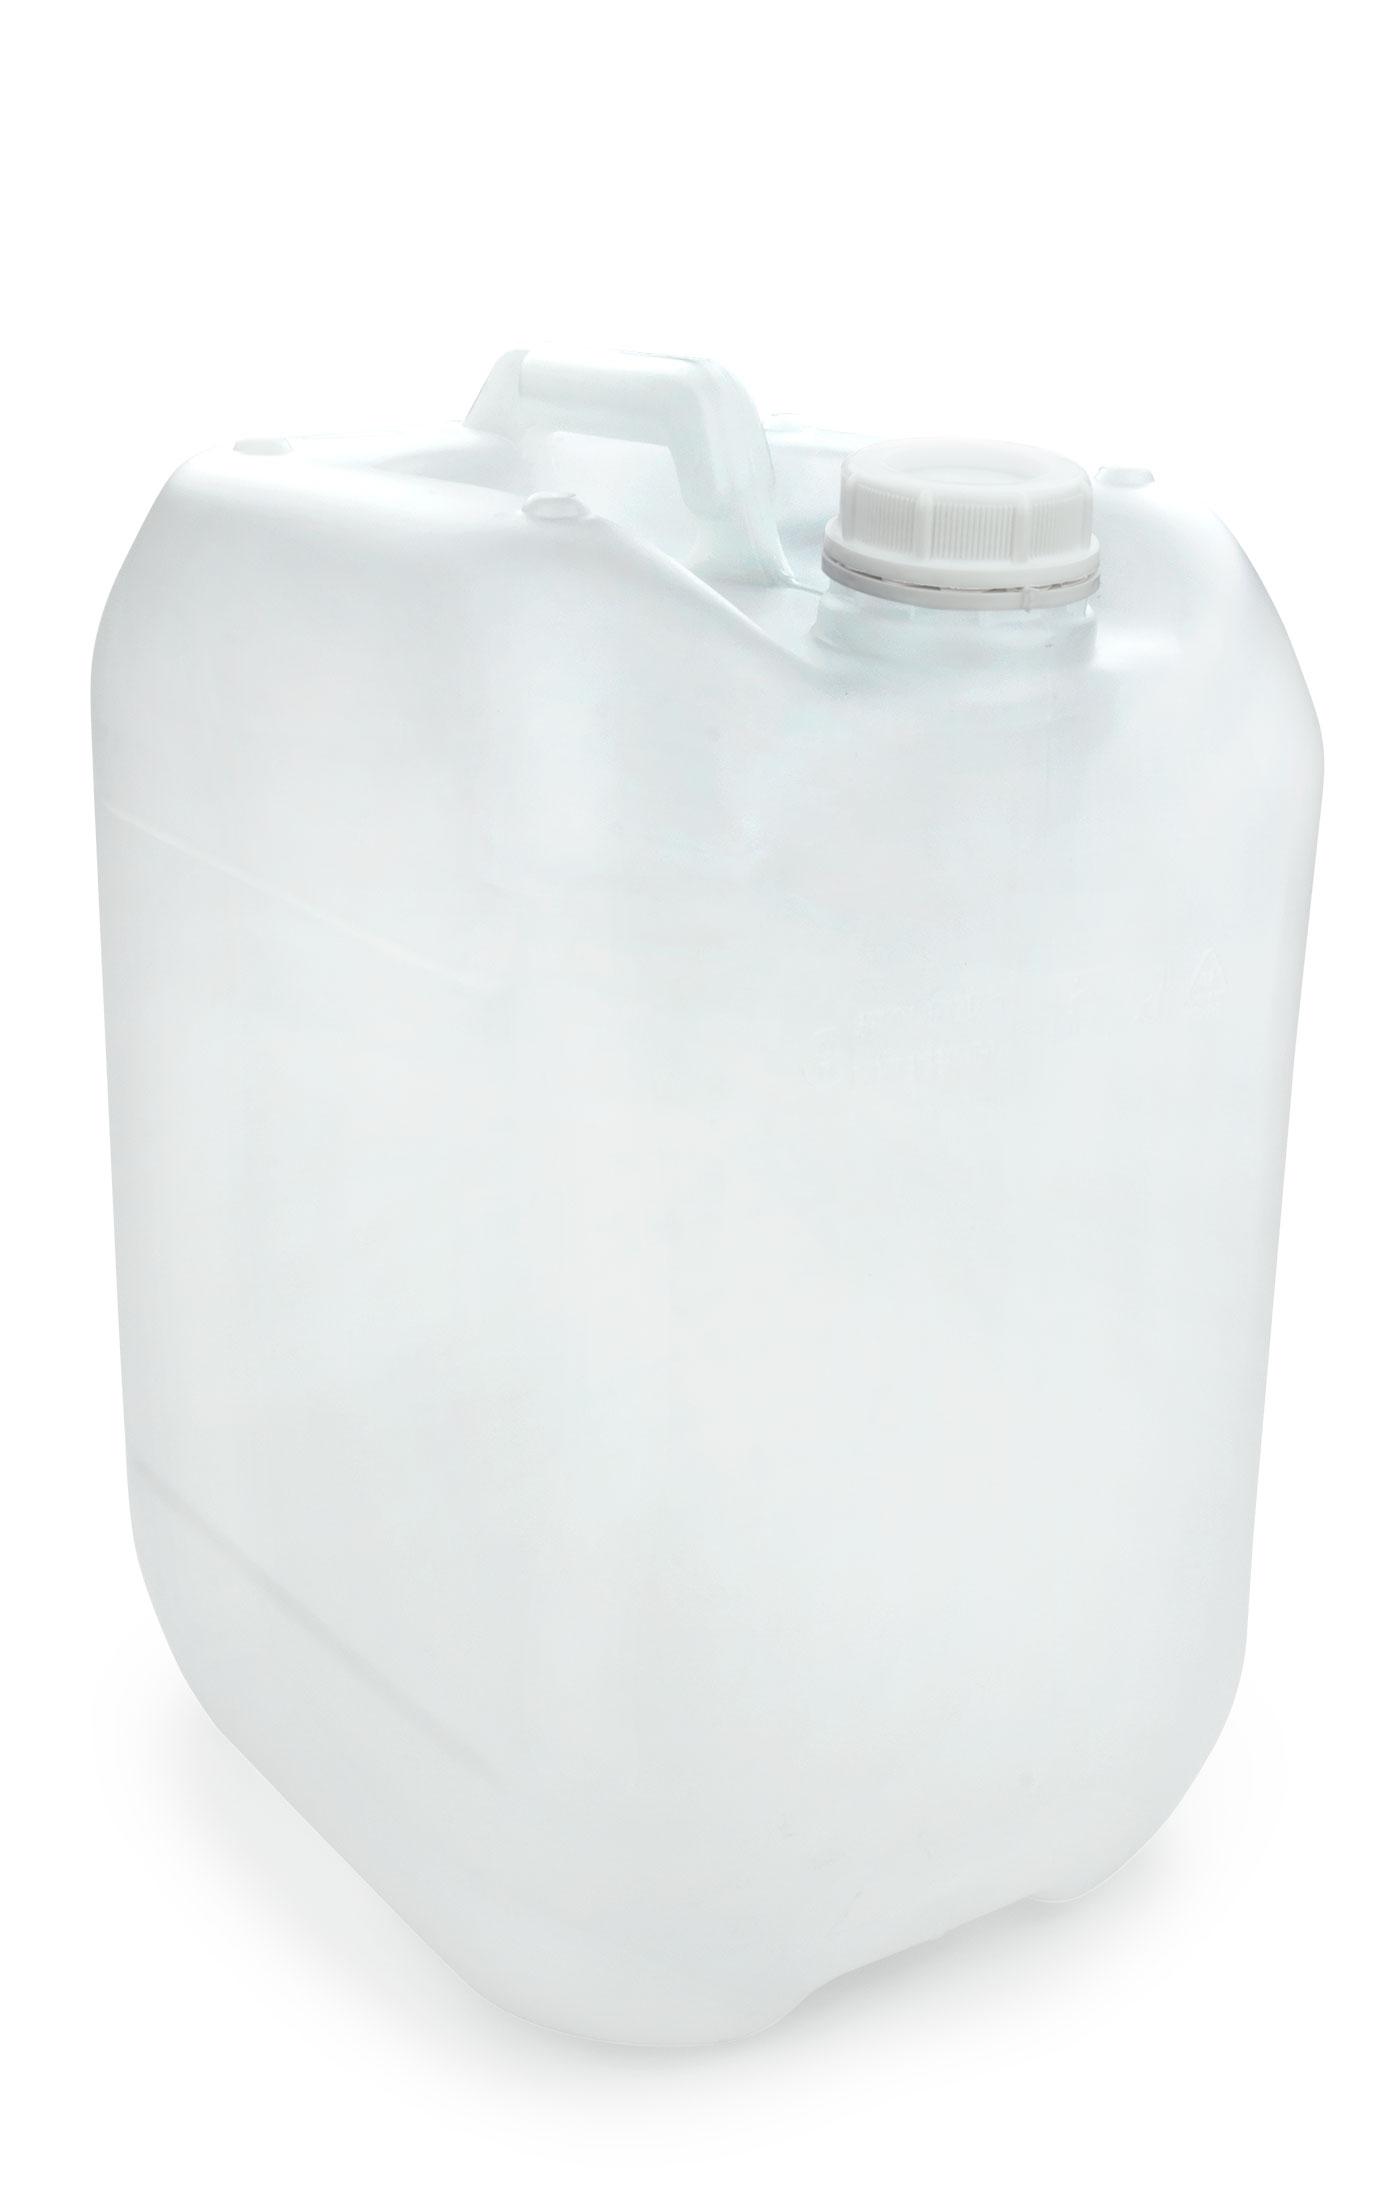 Wundervoll Kunststoff Kanister natur 20 Liter UN stapelbar mit  SX99